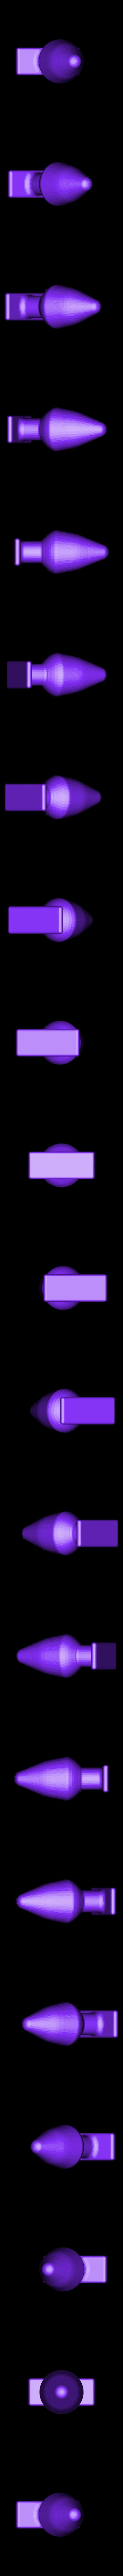 Plug Simple.stl Download free STL file Simple Anal Plug • 3D print template, Necrosodom